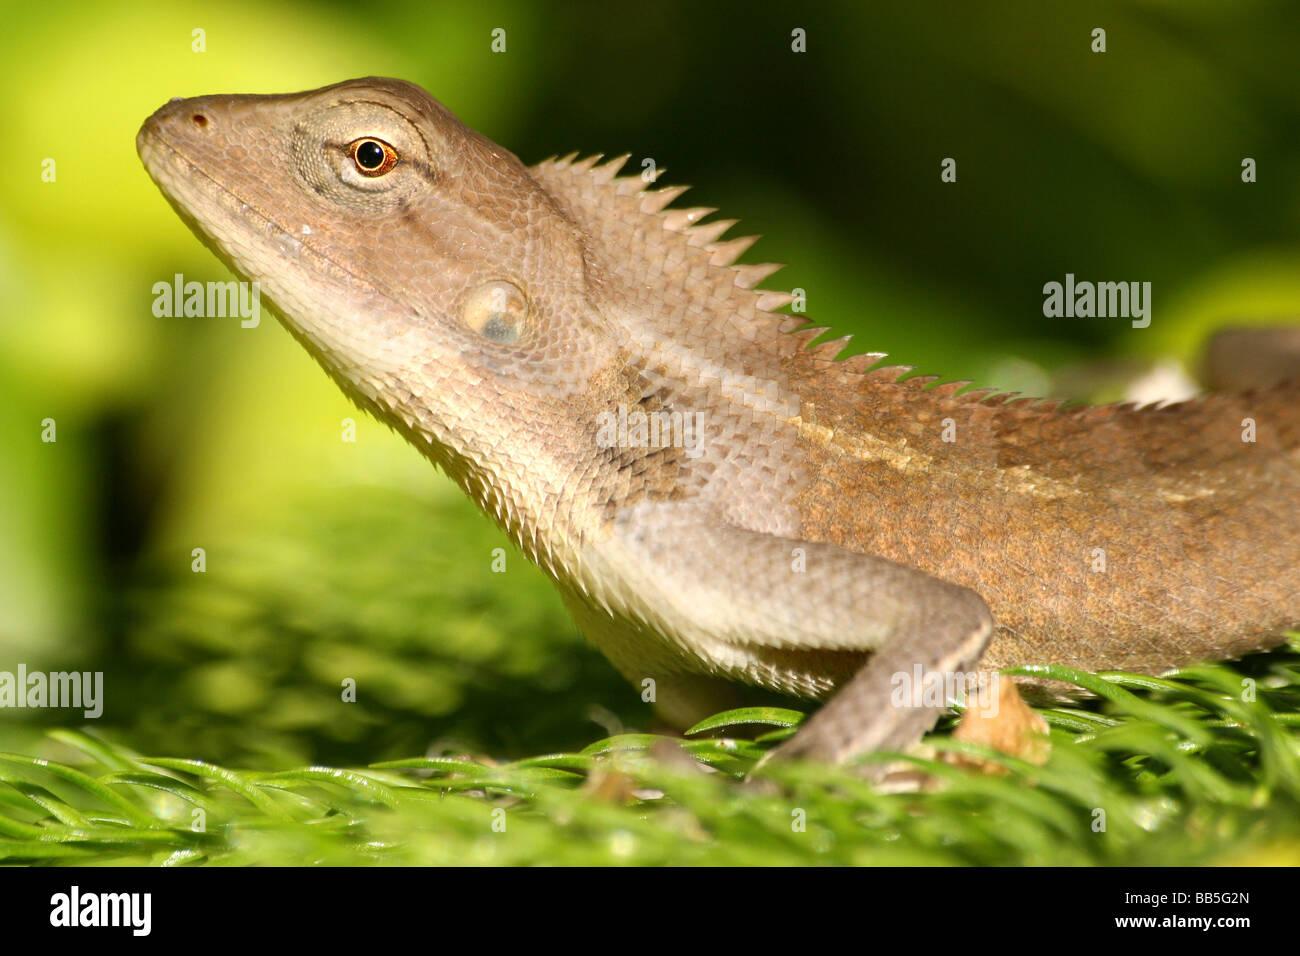 Nahaufnahme der Kopf des Oriental Garden Lizard Calotes versicolor Taken im Bundesstaat Assam, Indien Stockbild